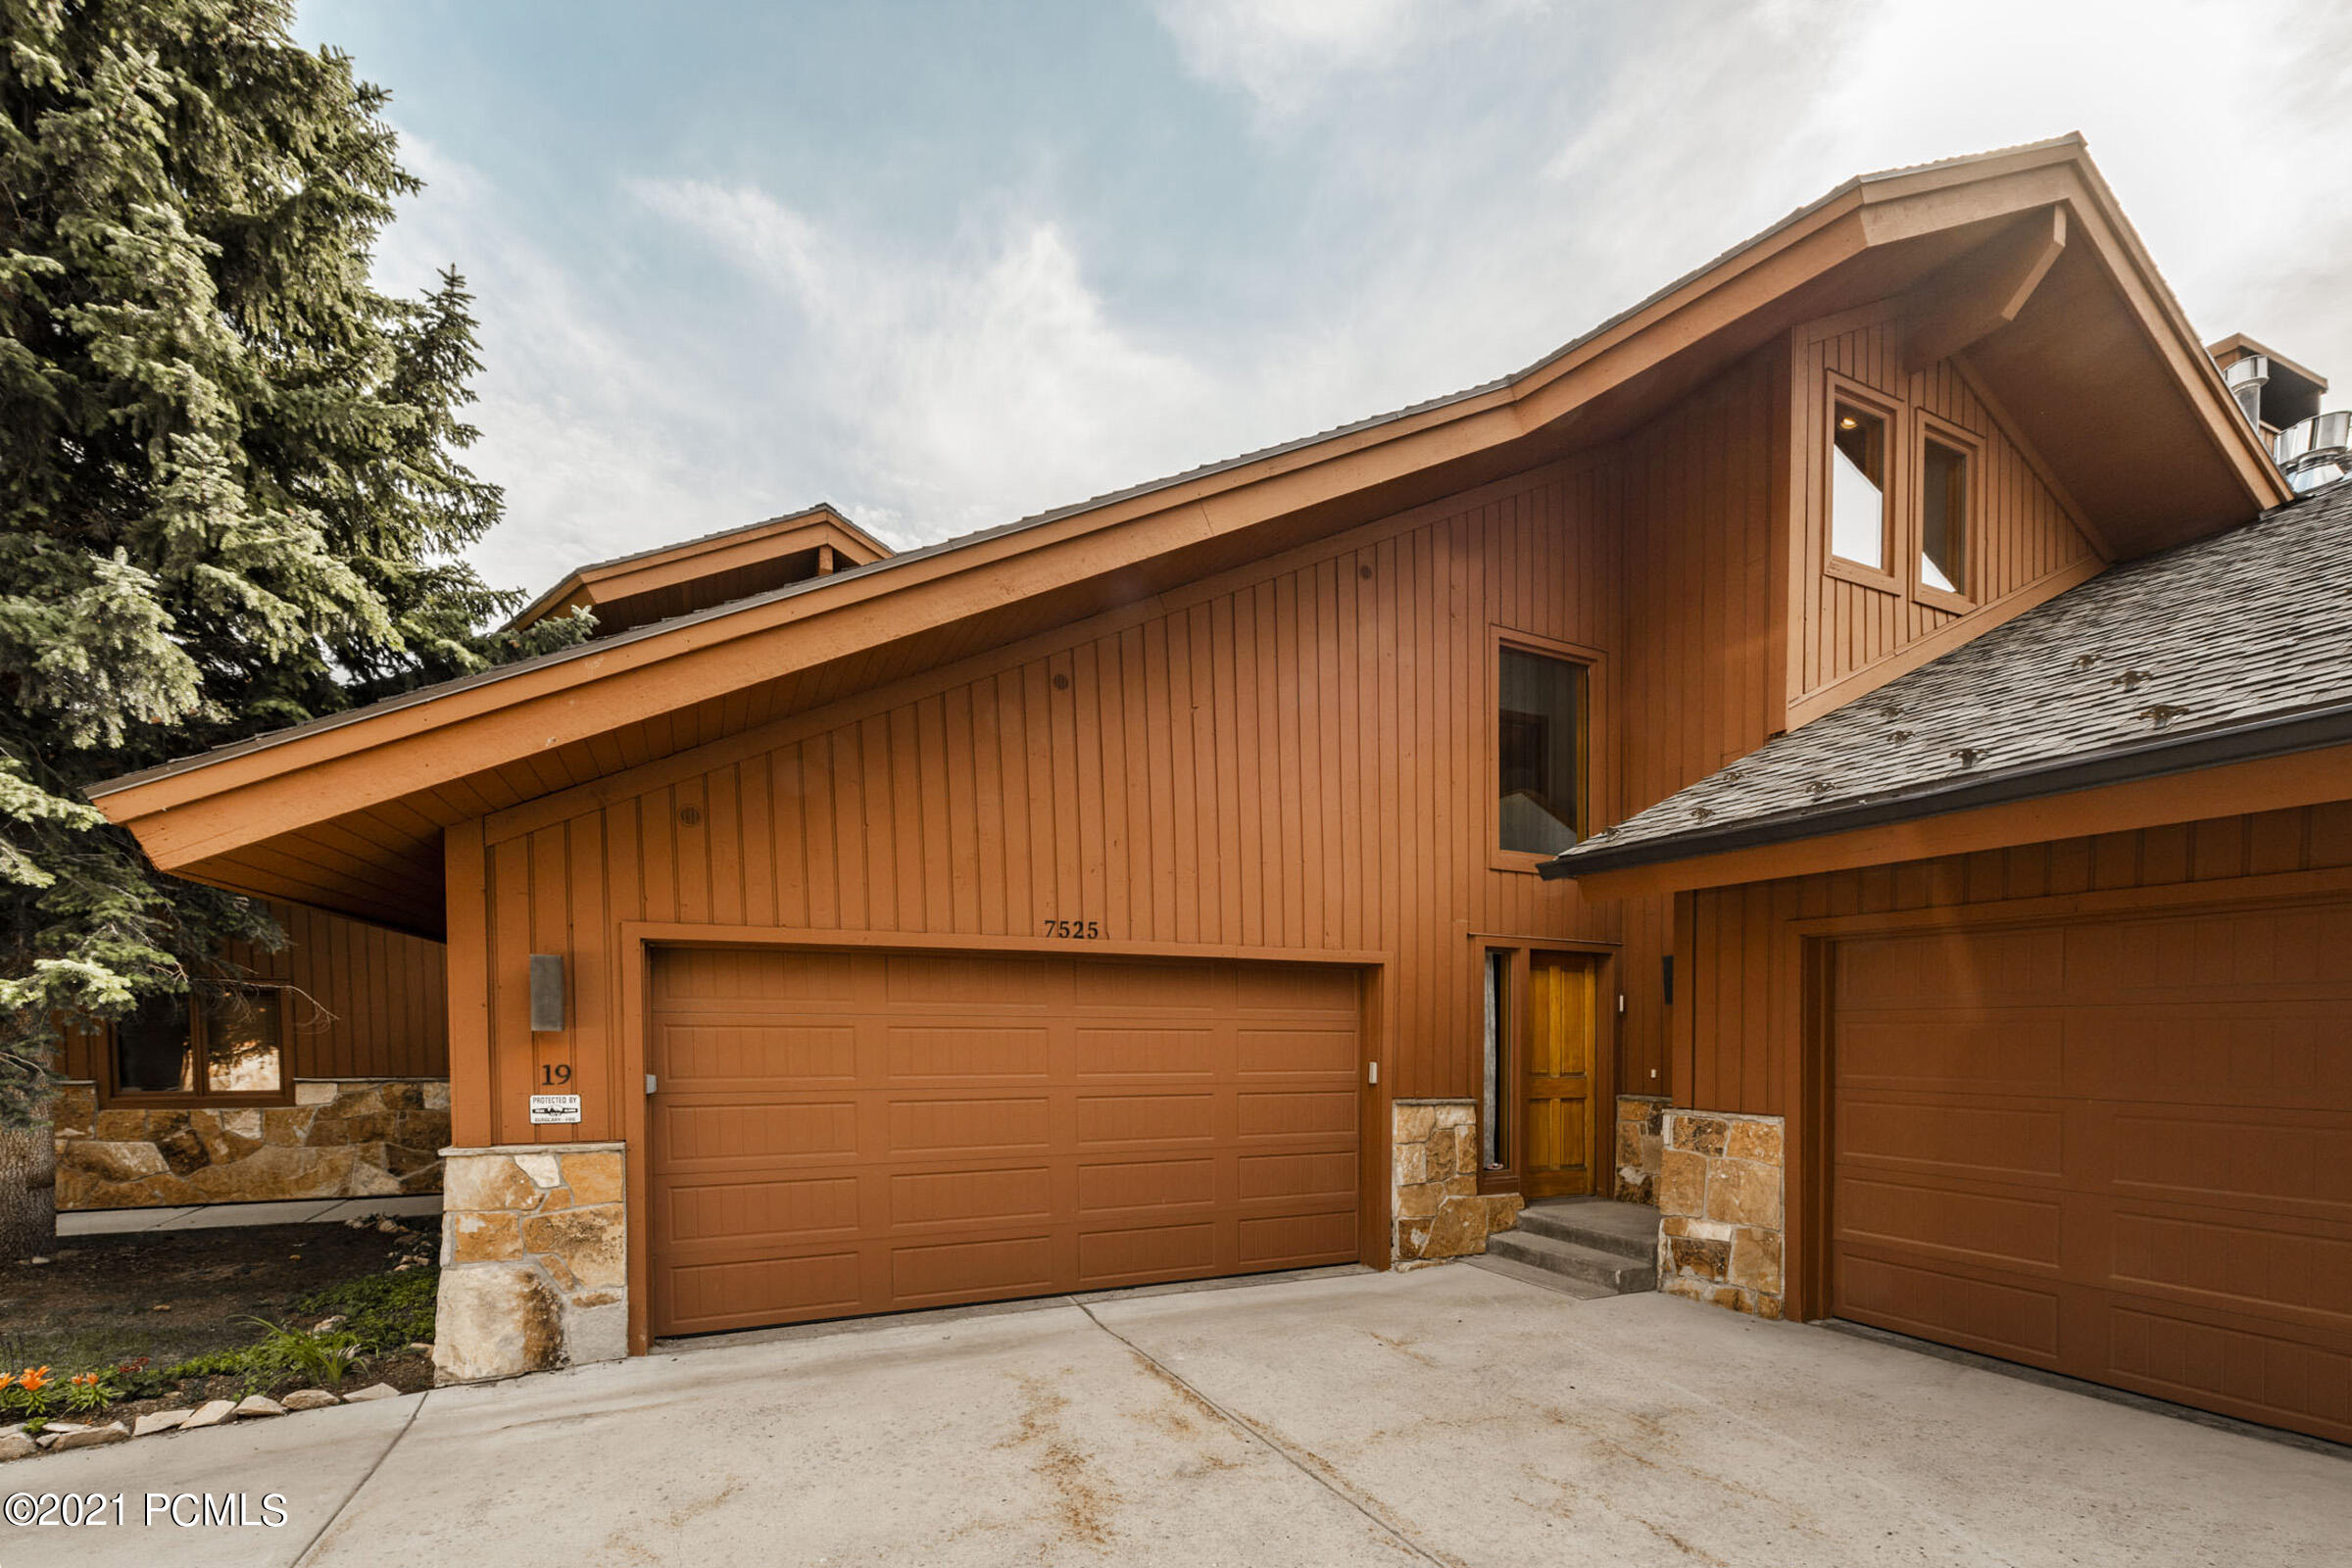 7525 Ridge Drive, Park City, Utah 84060, 3 Bedrooms Bedrooms, ,3 BathroomsBathrooms,Condominium,For Sale,Ridge,12102960